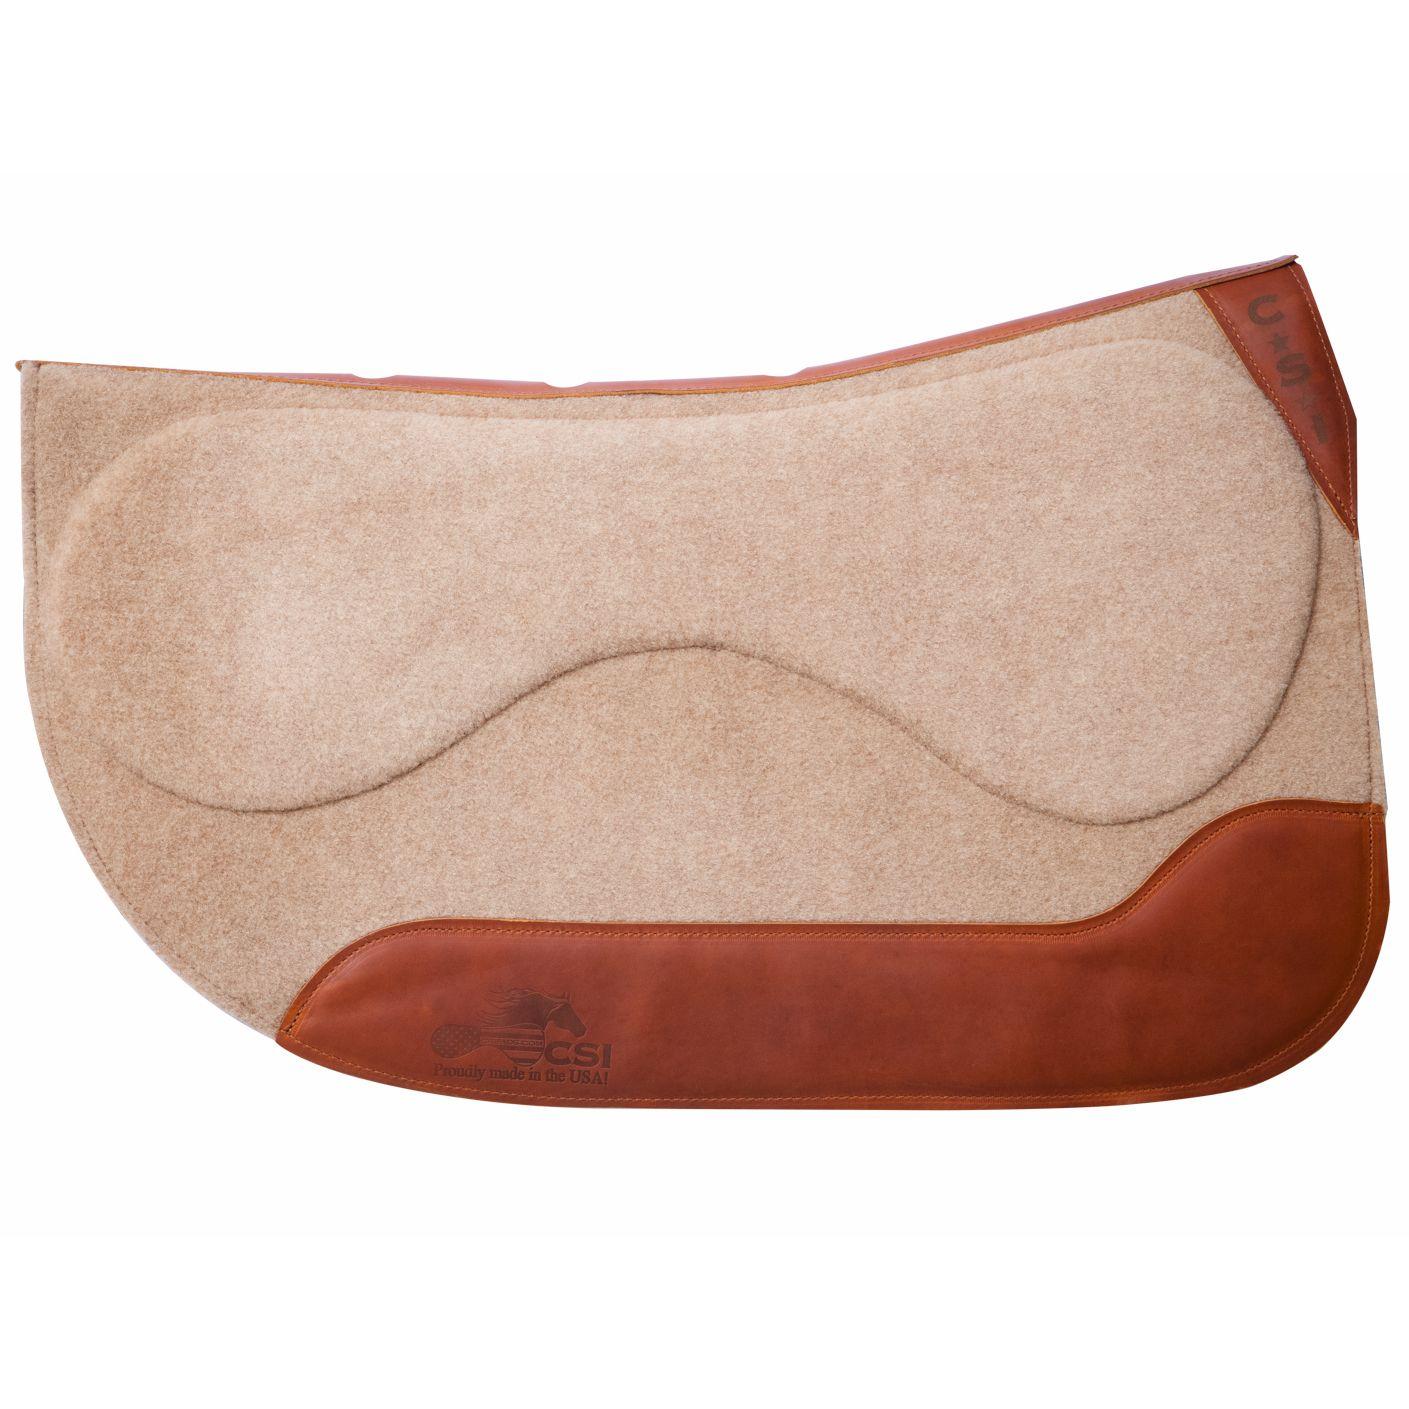 CSI Standard Western Flexplate Saddle Pad